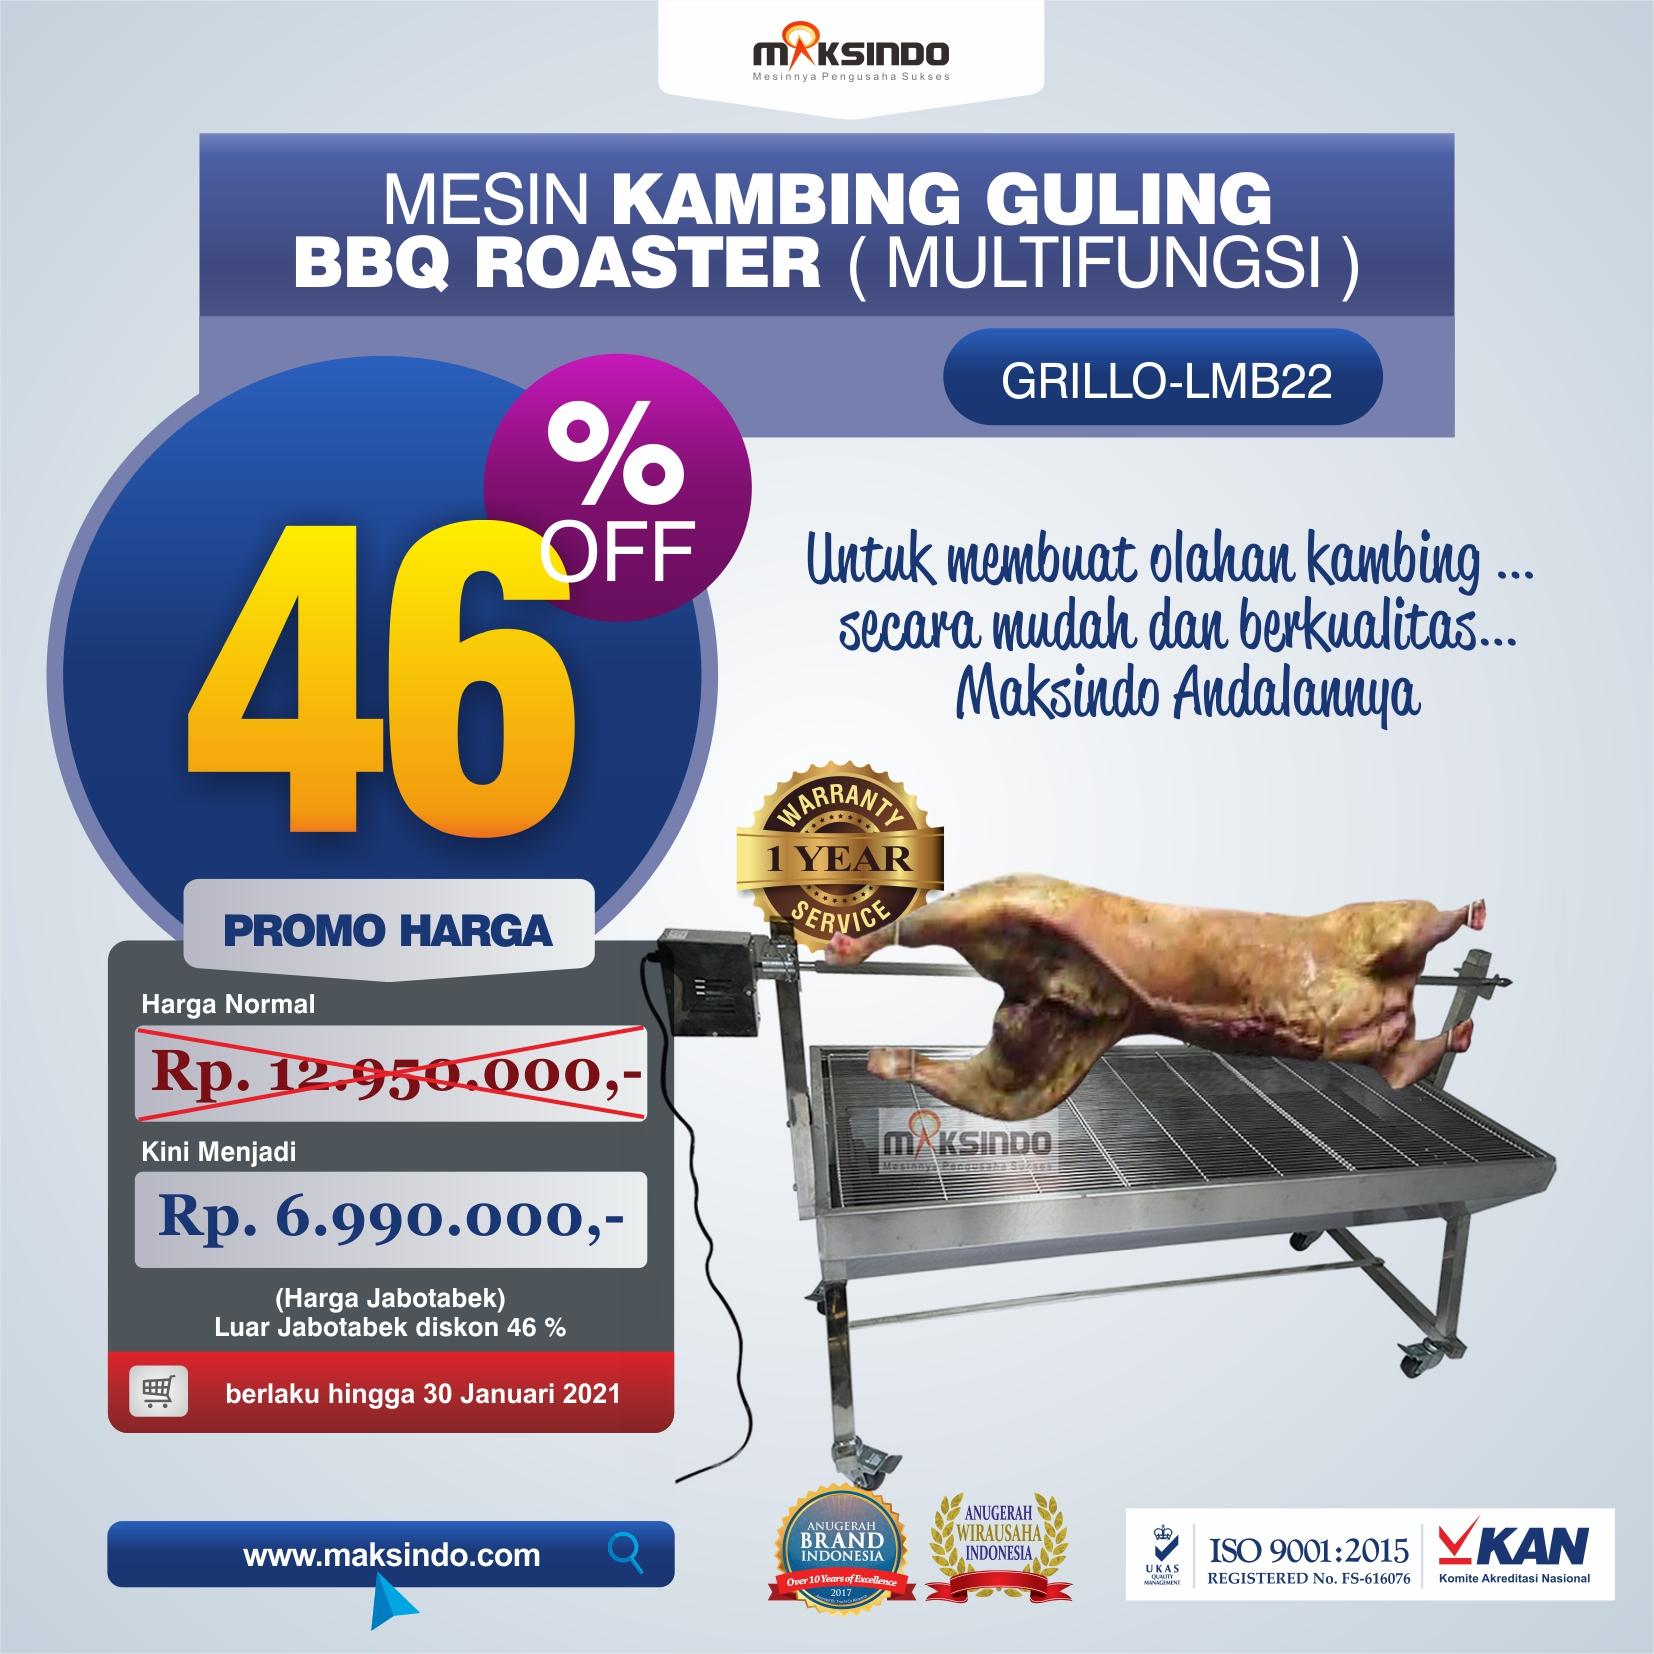 Jual Mesin Kambing Guling BBQ Roaster (GRILLO-LMB22) di Semarang